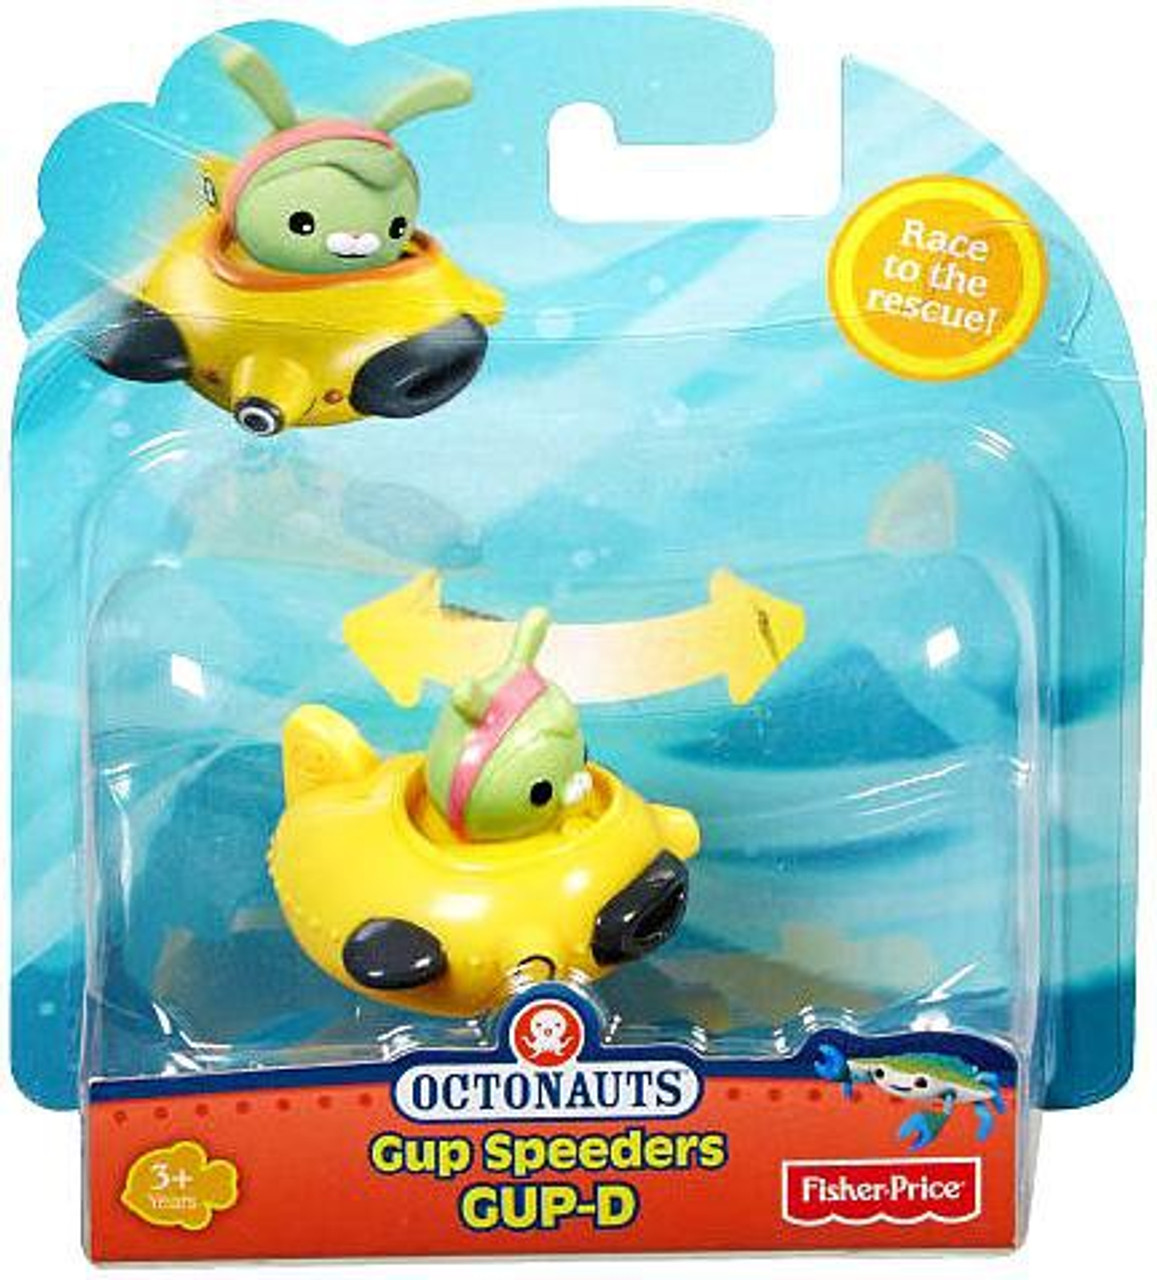 Fisher Price Octonauts Gup Speeders GUP-D Toy Vehicle